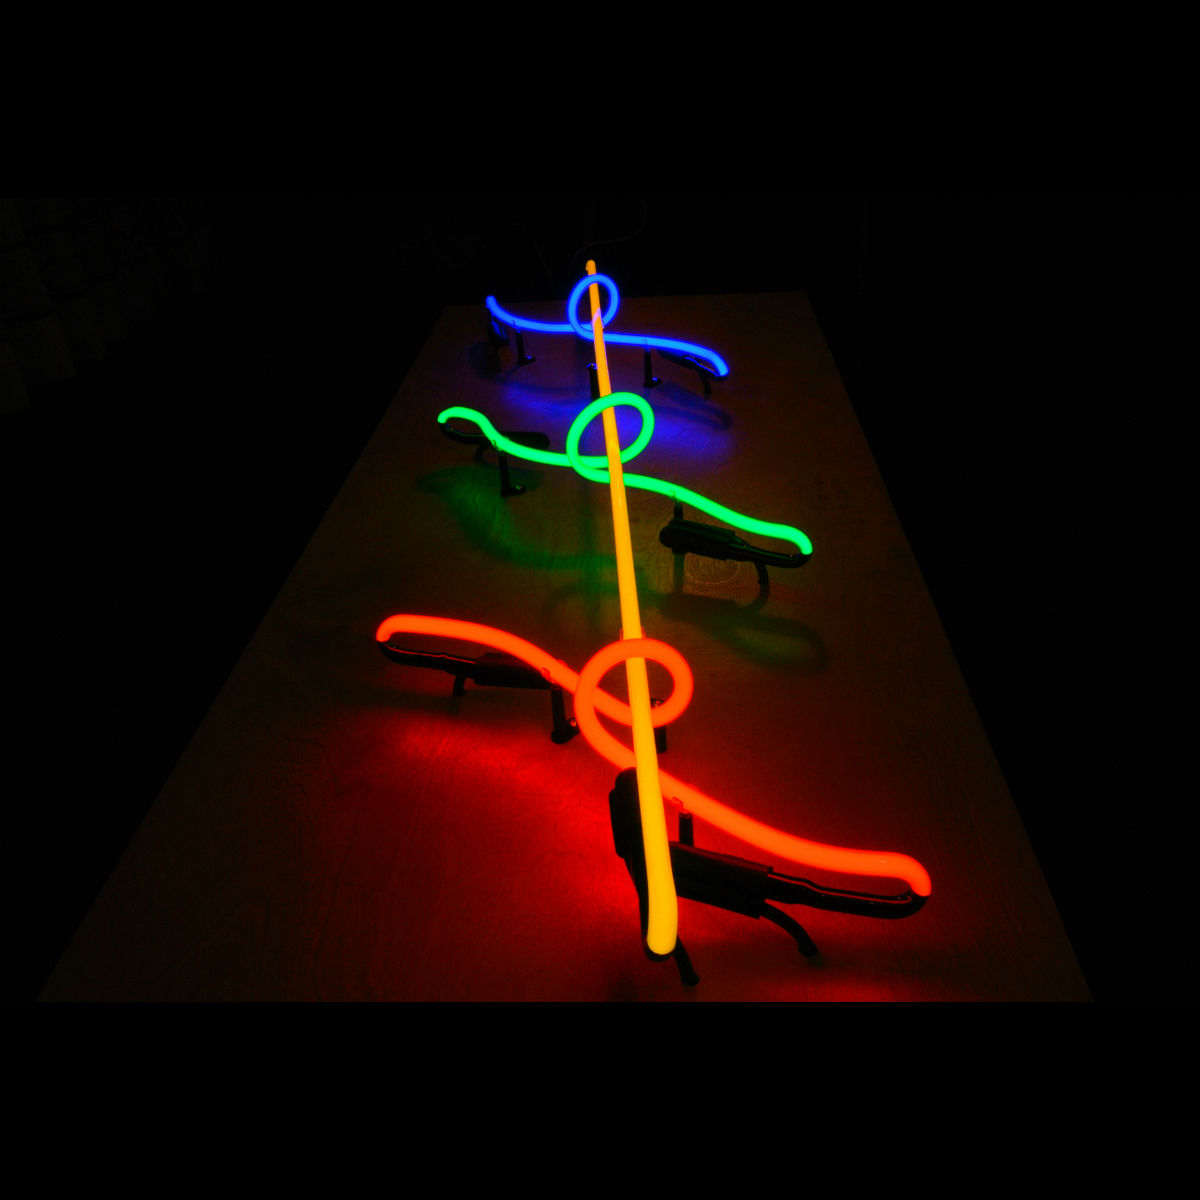 Elegant Custom Neon Light Sculptures by John Barton - BartonNeonMagic.com